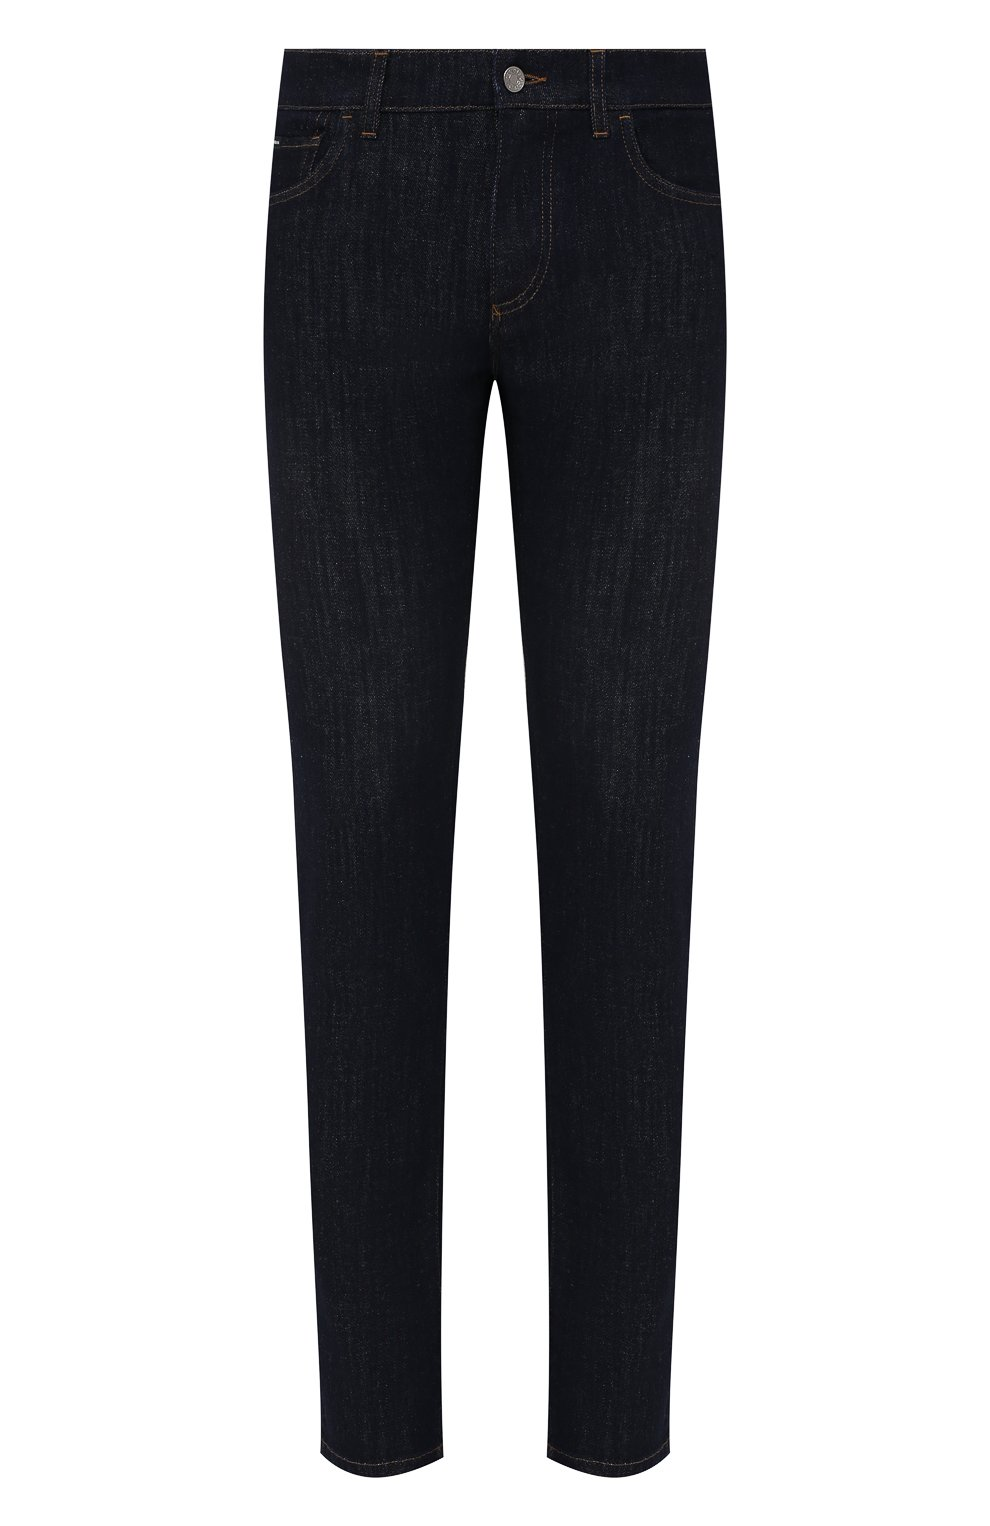 Мужские джинсы DOLCE & GABBANA синего цвета, арт. GY07LD/G8CR2 | Фото 1